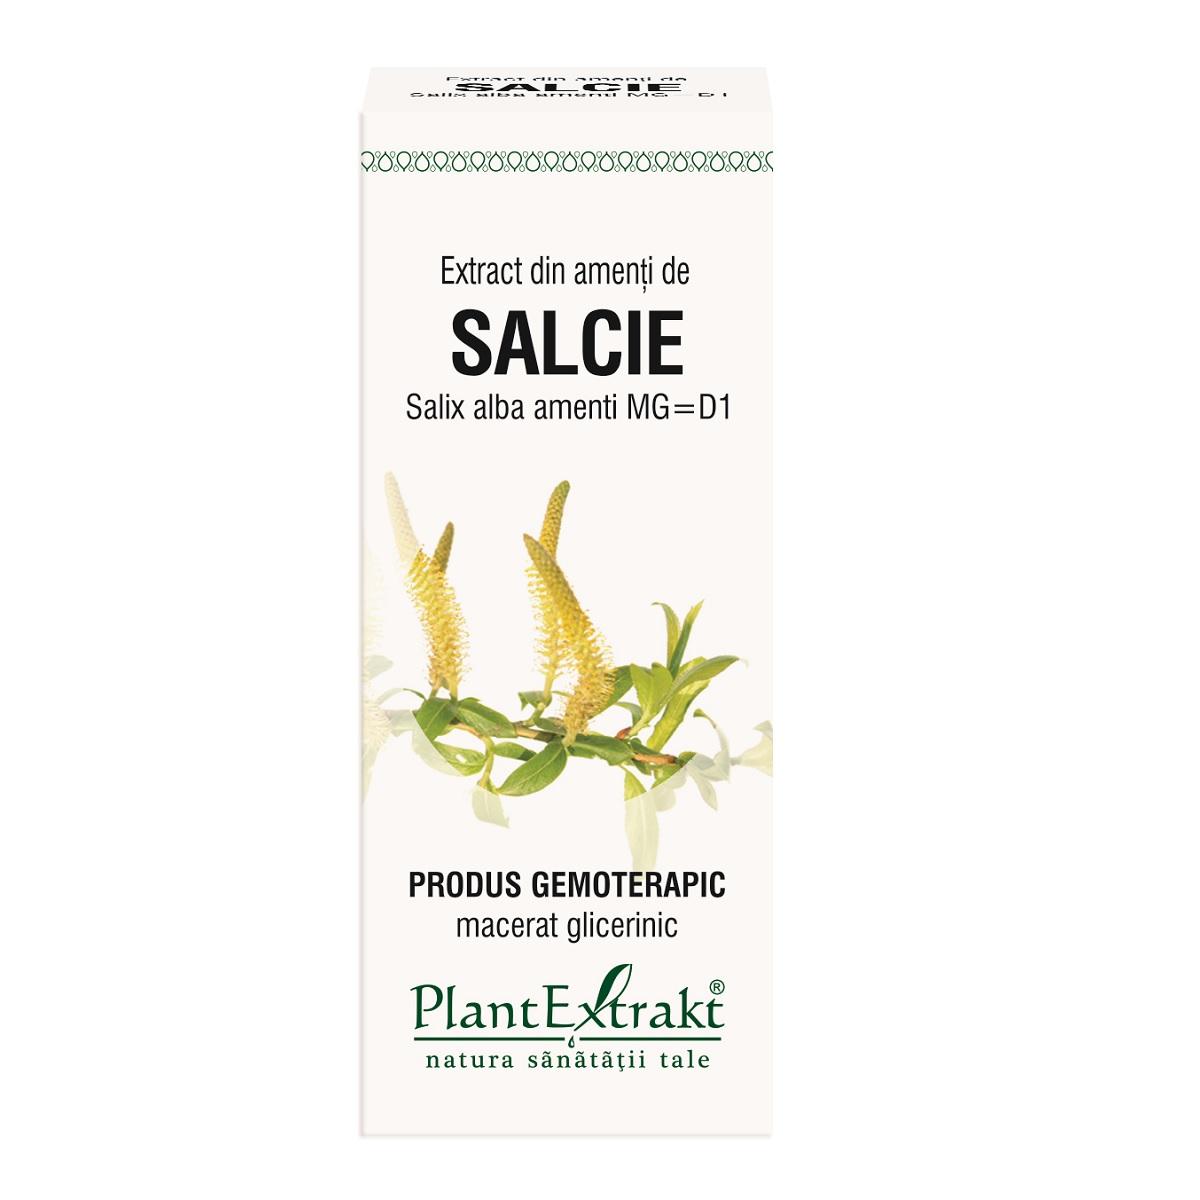 Extract din amenti de salcie salix, 50 ml, Plant Extrakt